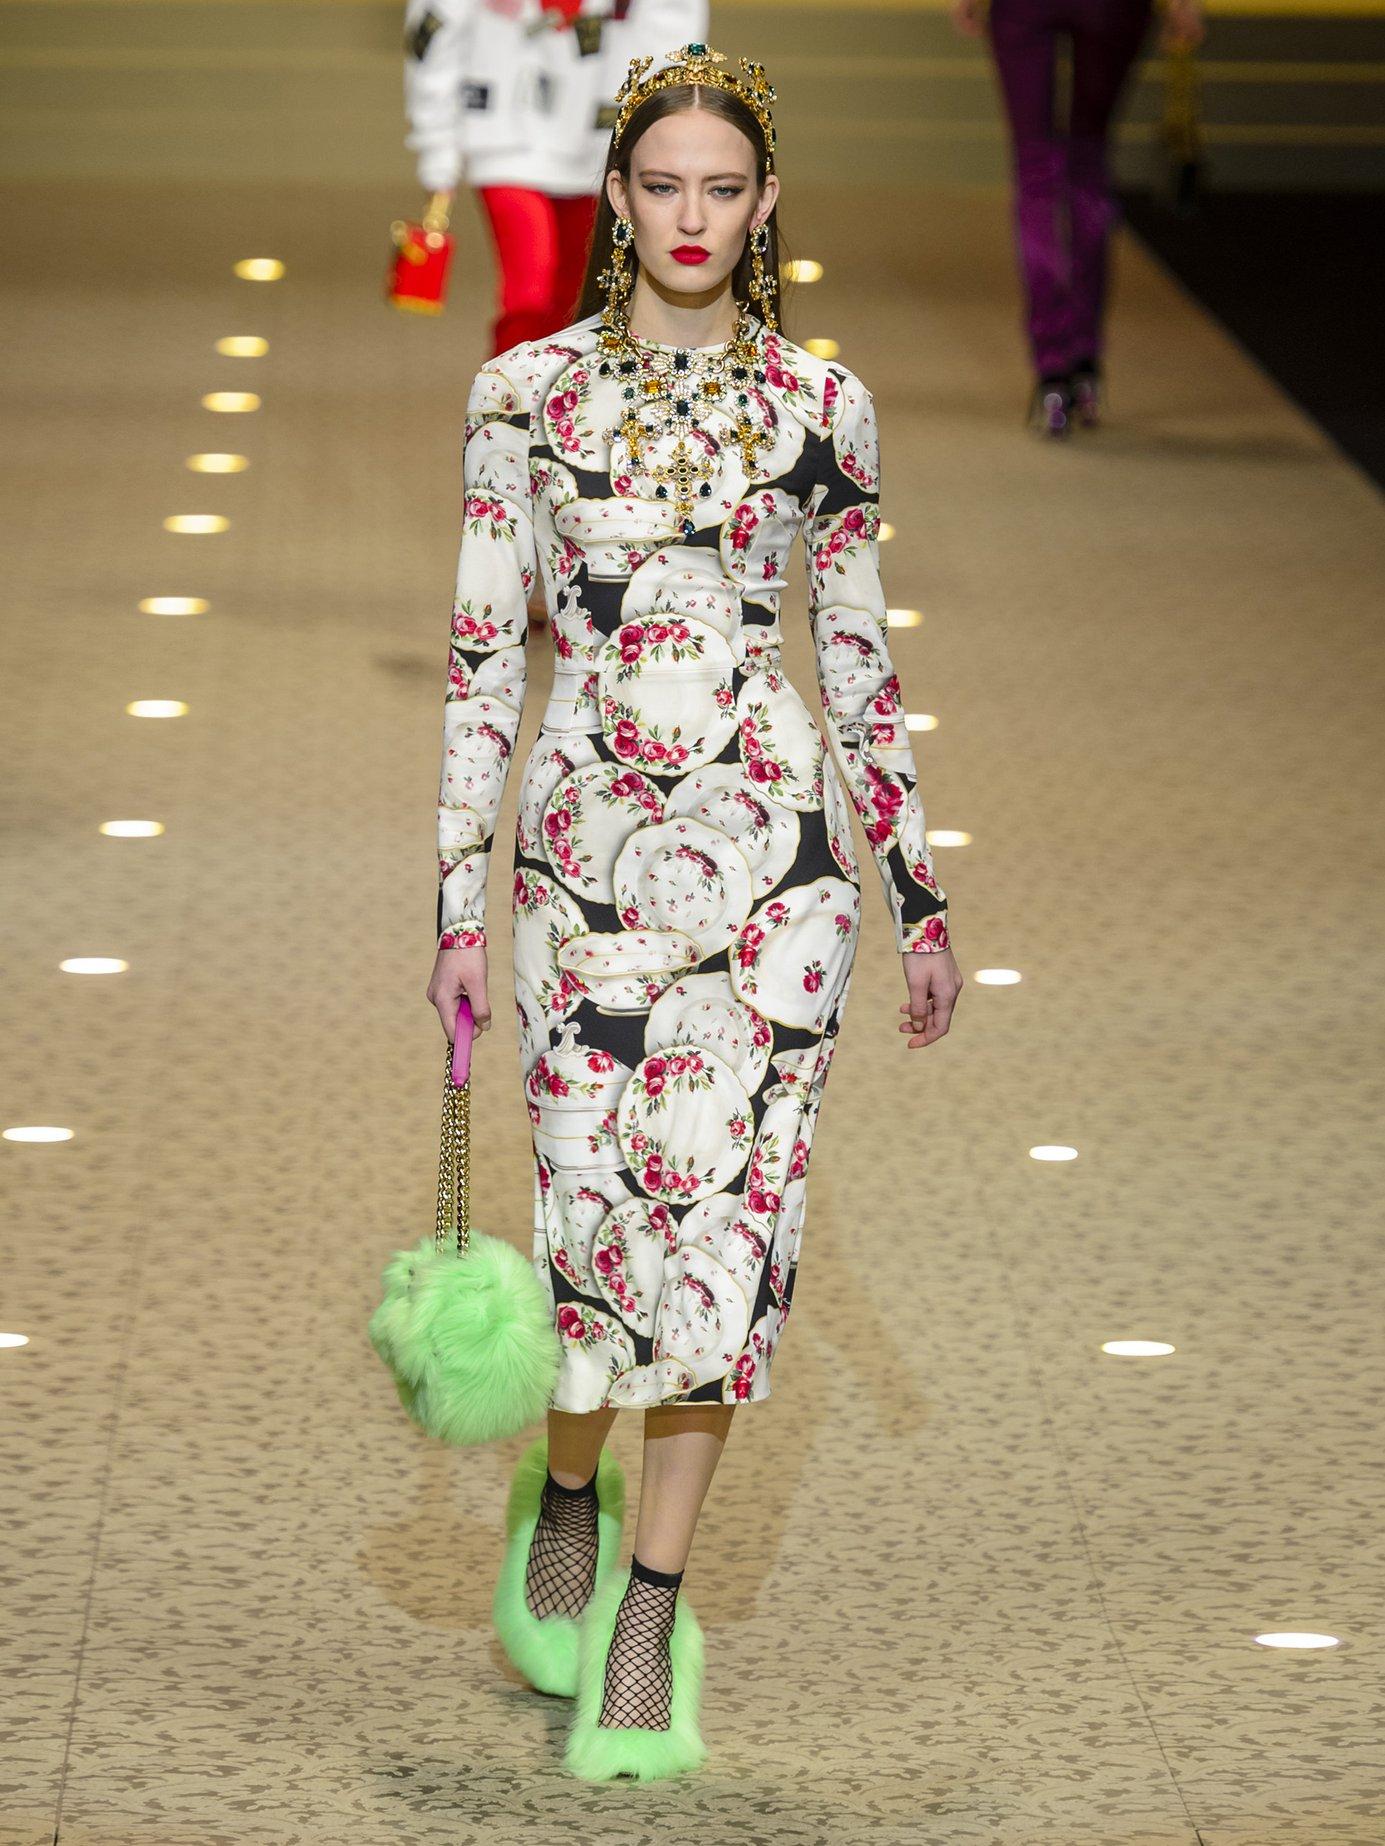 Plate-print stretch-crepe midi dress by Dolce & Gabbana